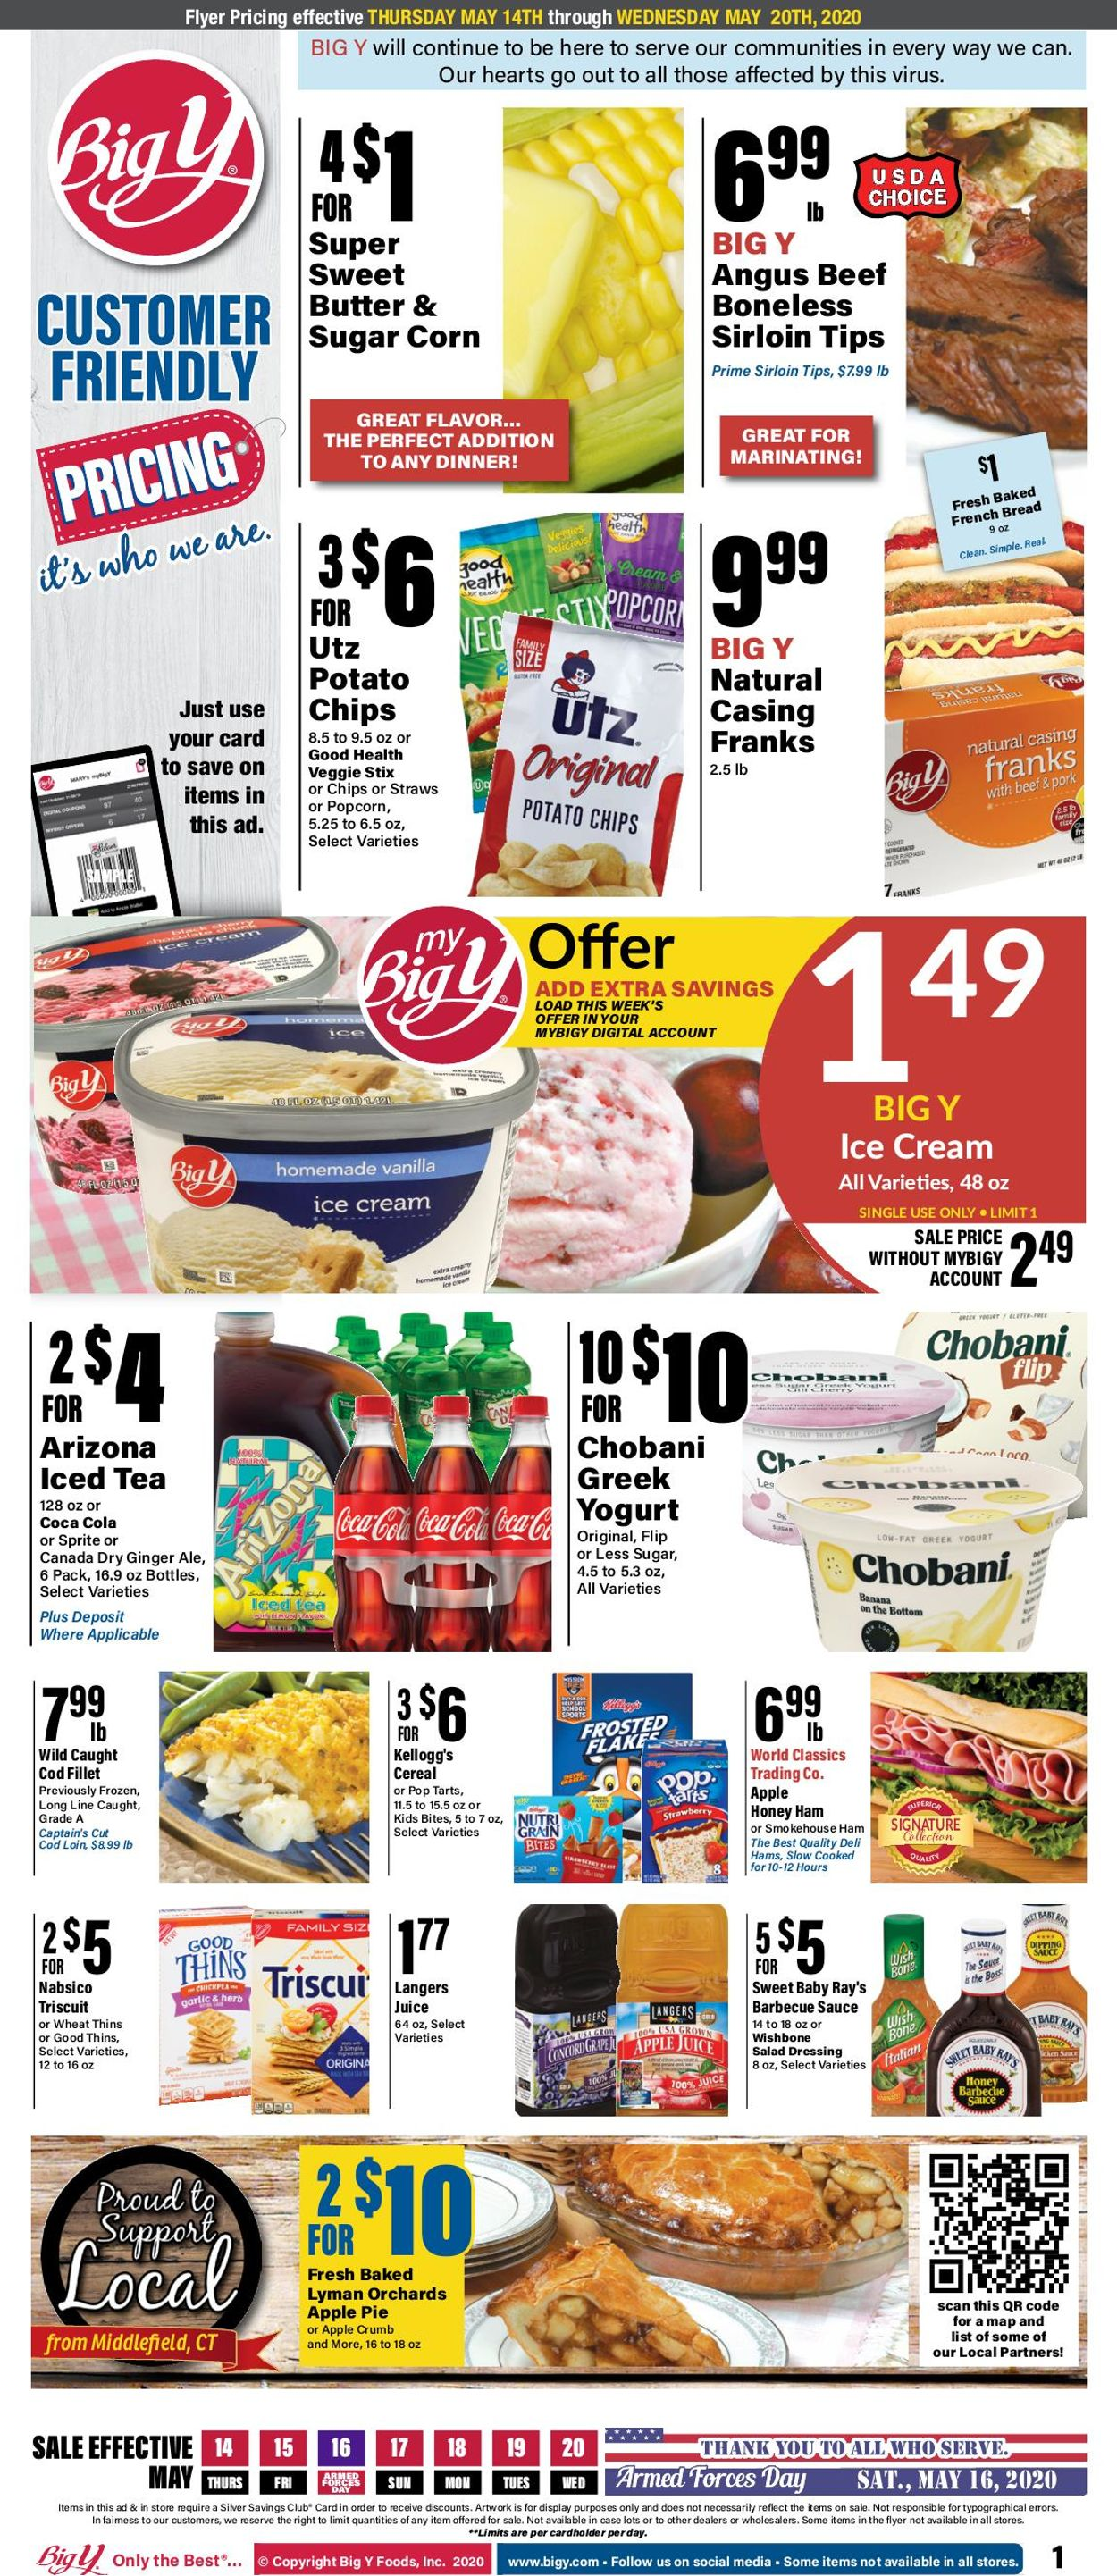 Big Y Weekly Ad Circular - valid 05/14-05/20/2020